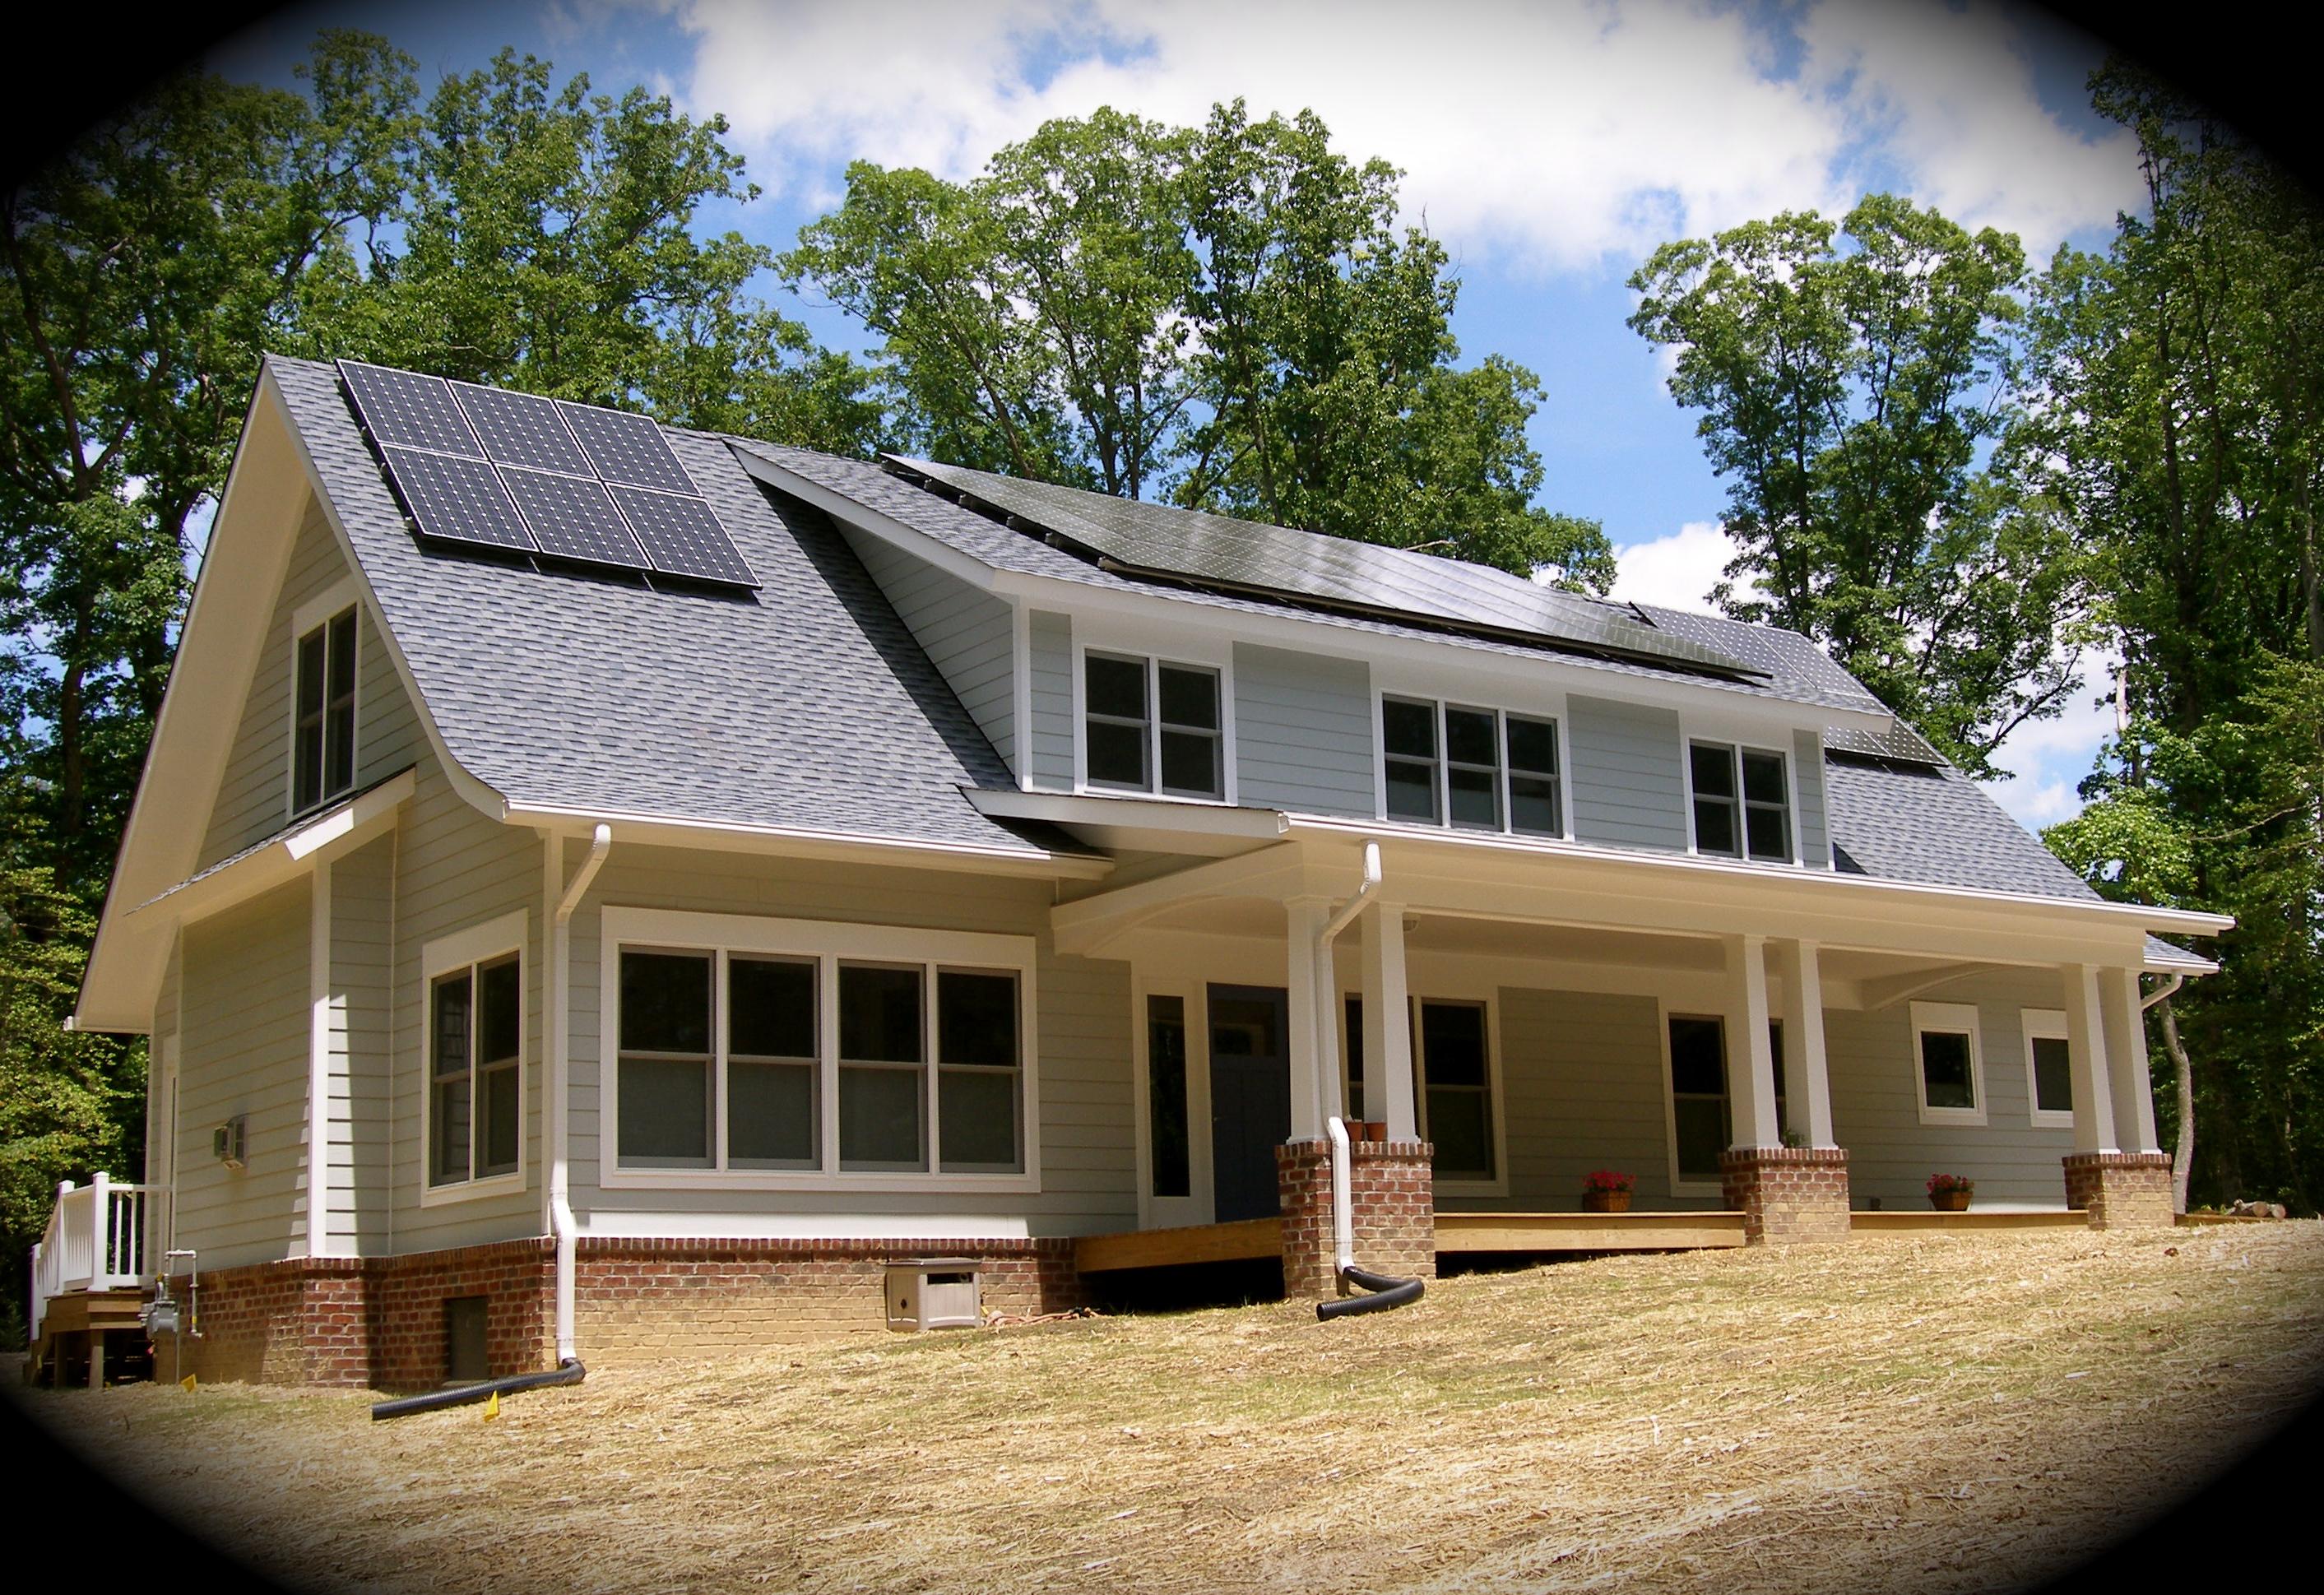 Franck net-zero Solar Home, Williamsburg